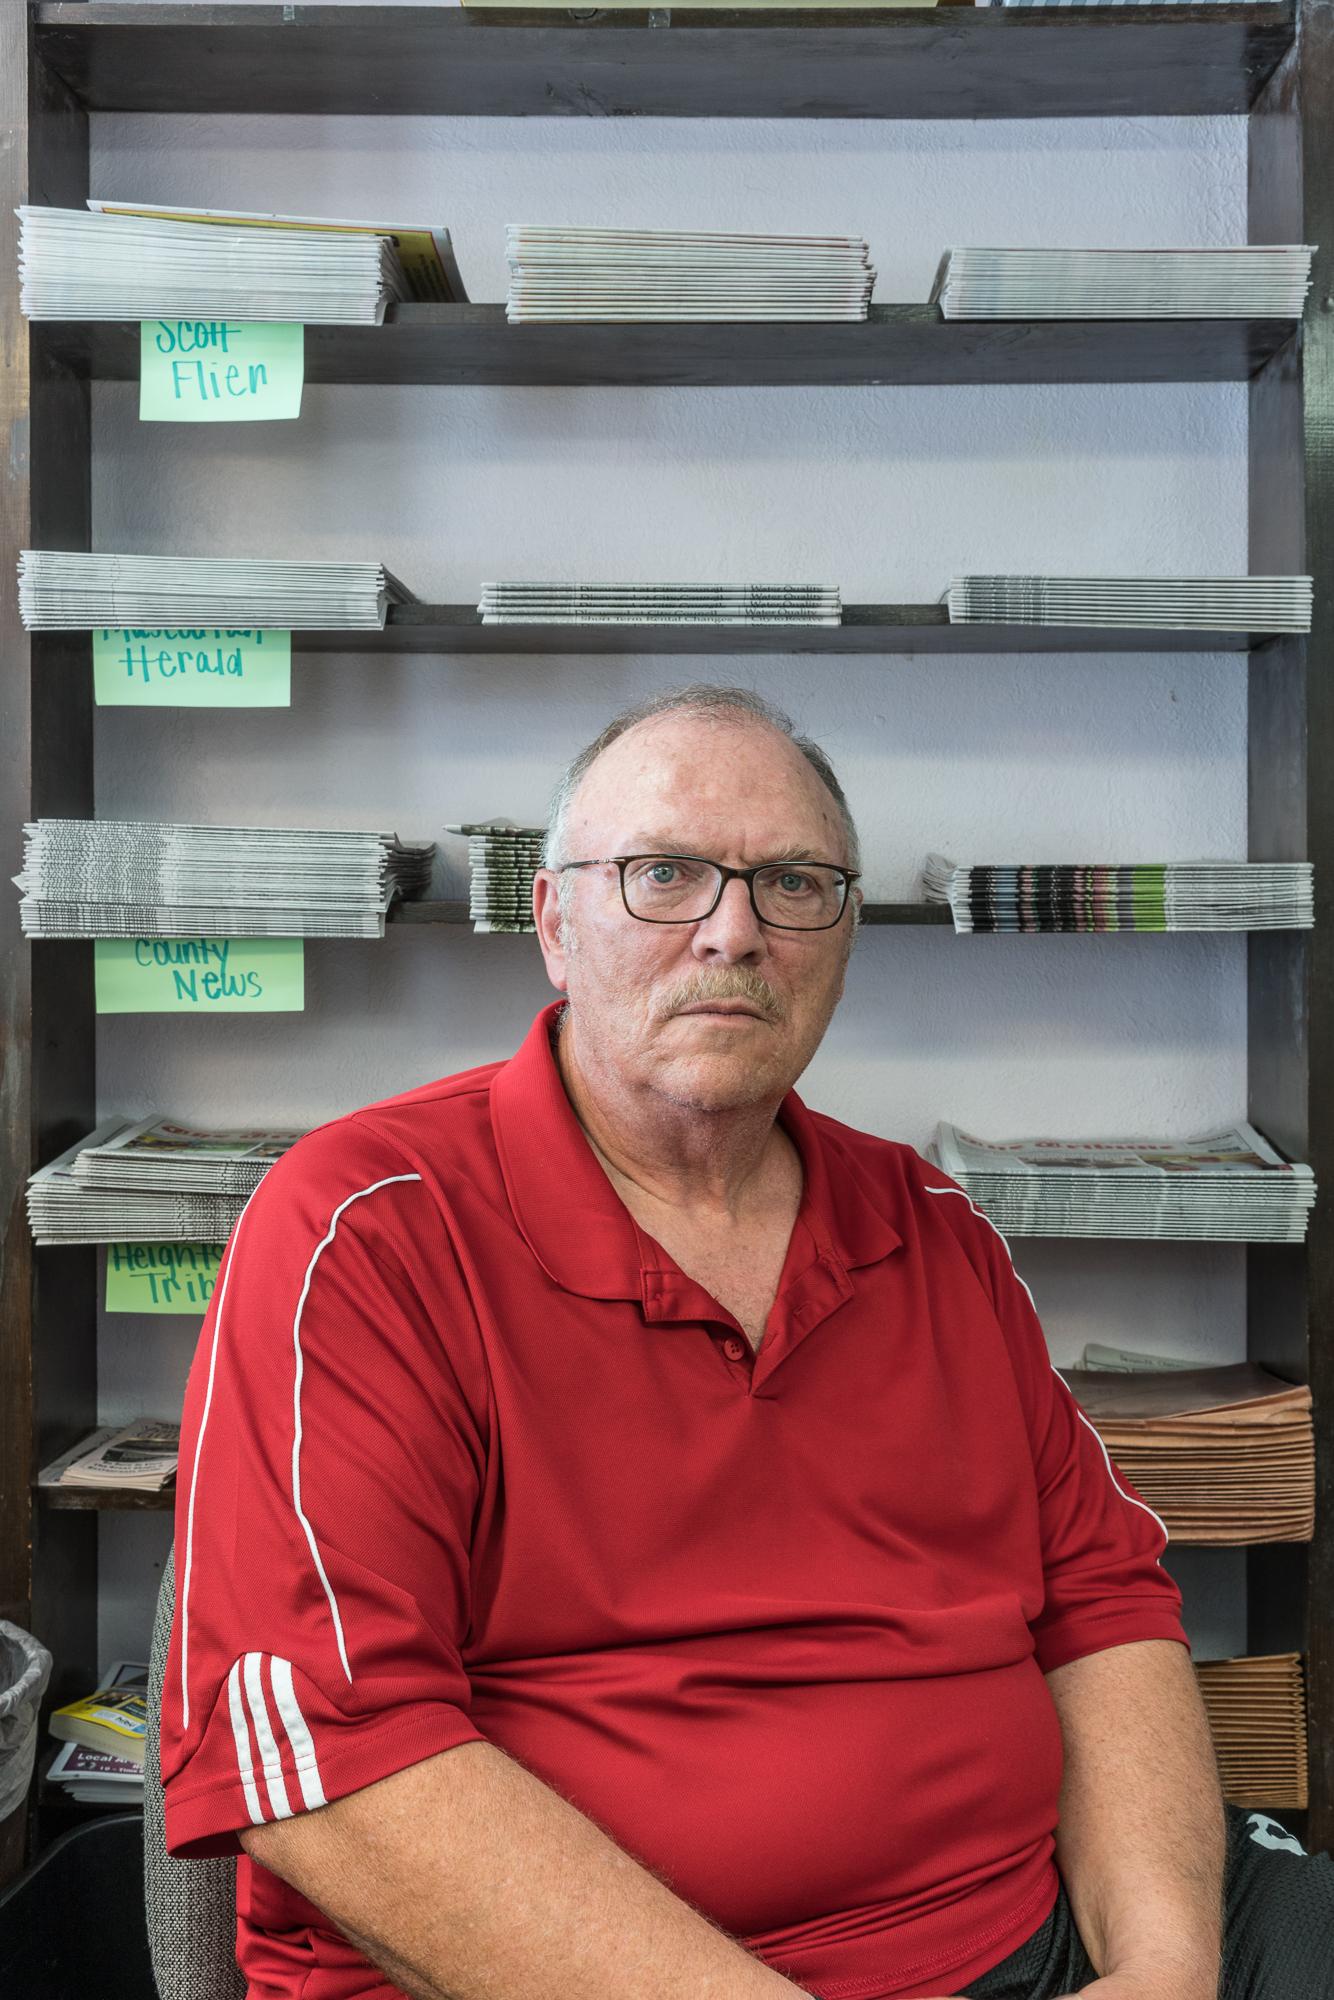 Gene at the Herald, Mascoutah, Illinois, 2017